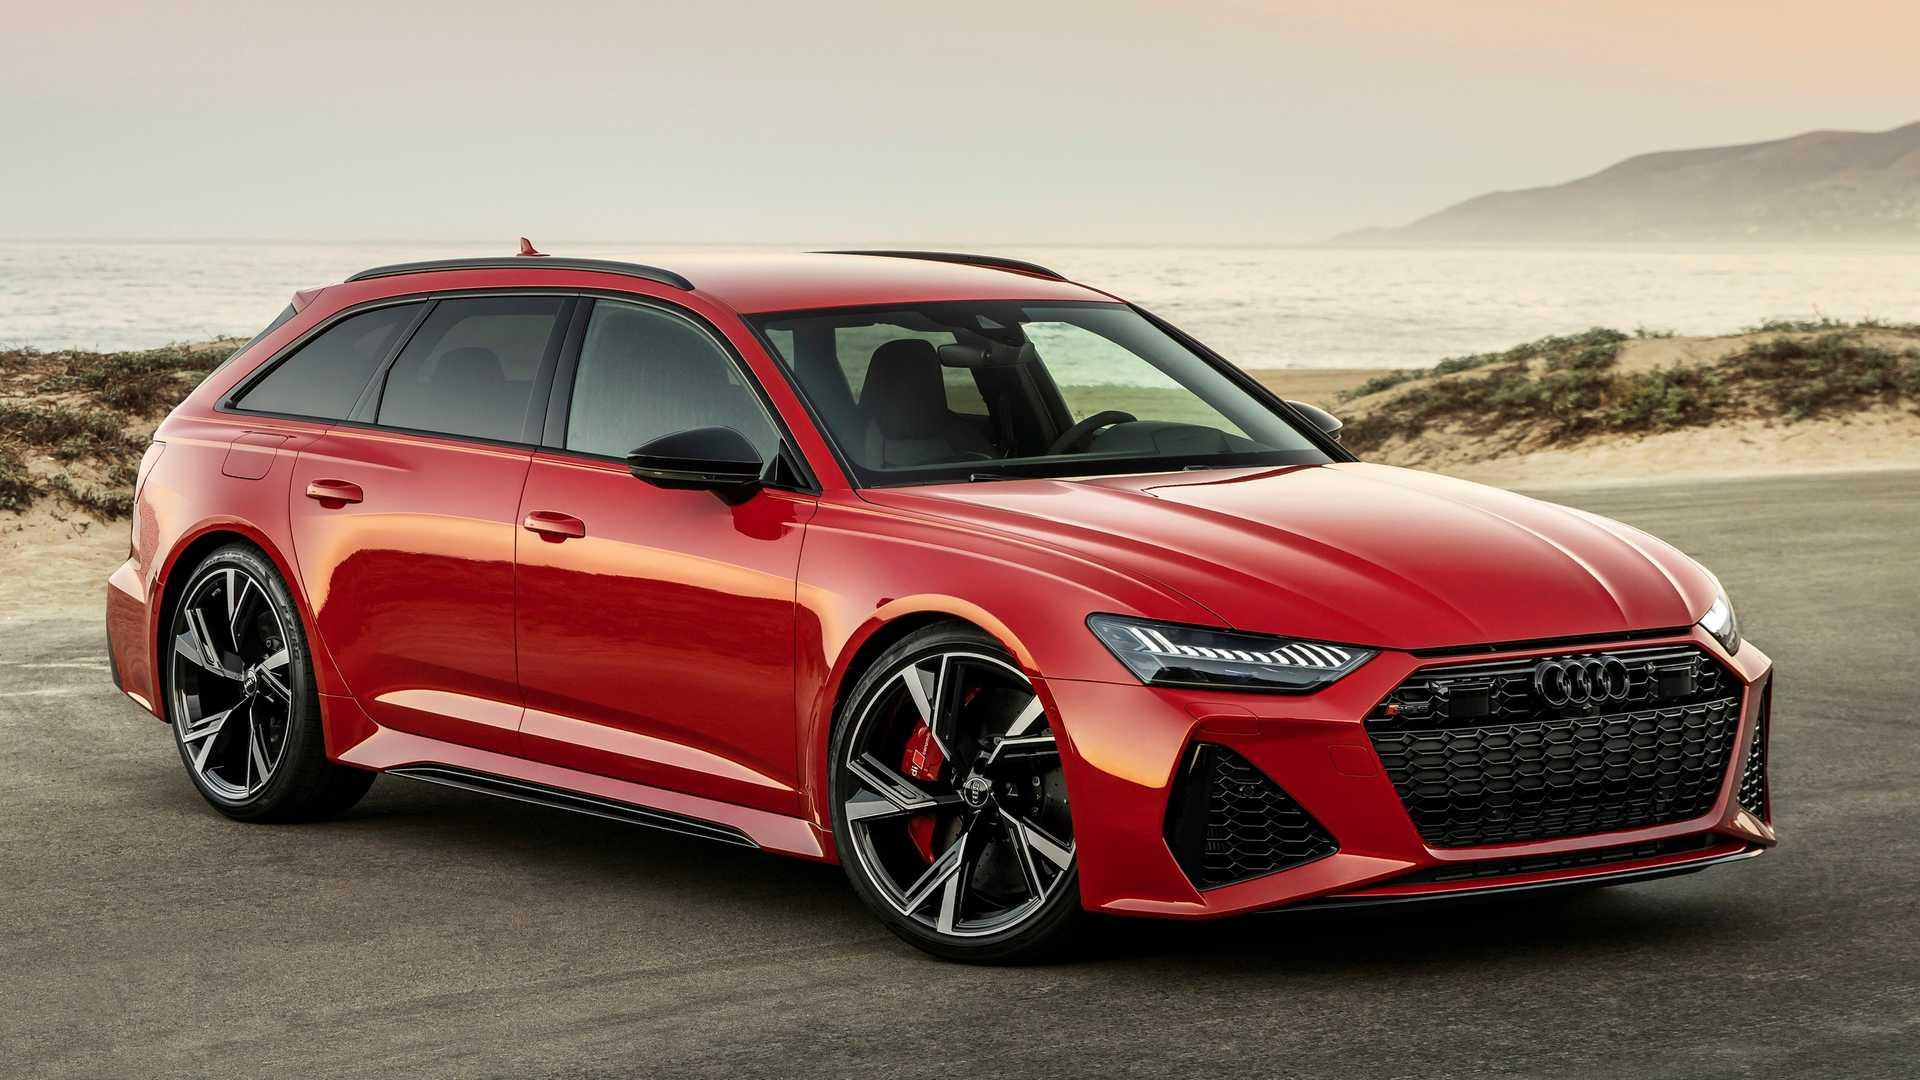 2021 Audi Rs6 Avant Price Starts At 109 000 For U S Market